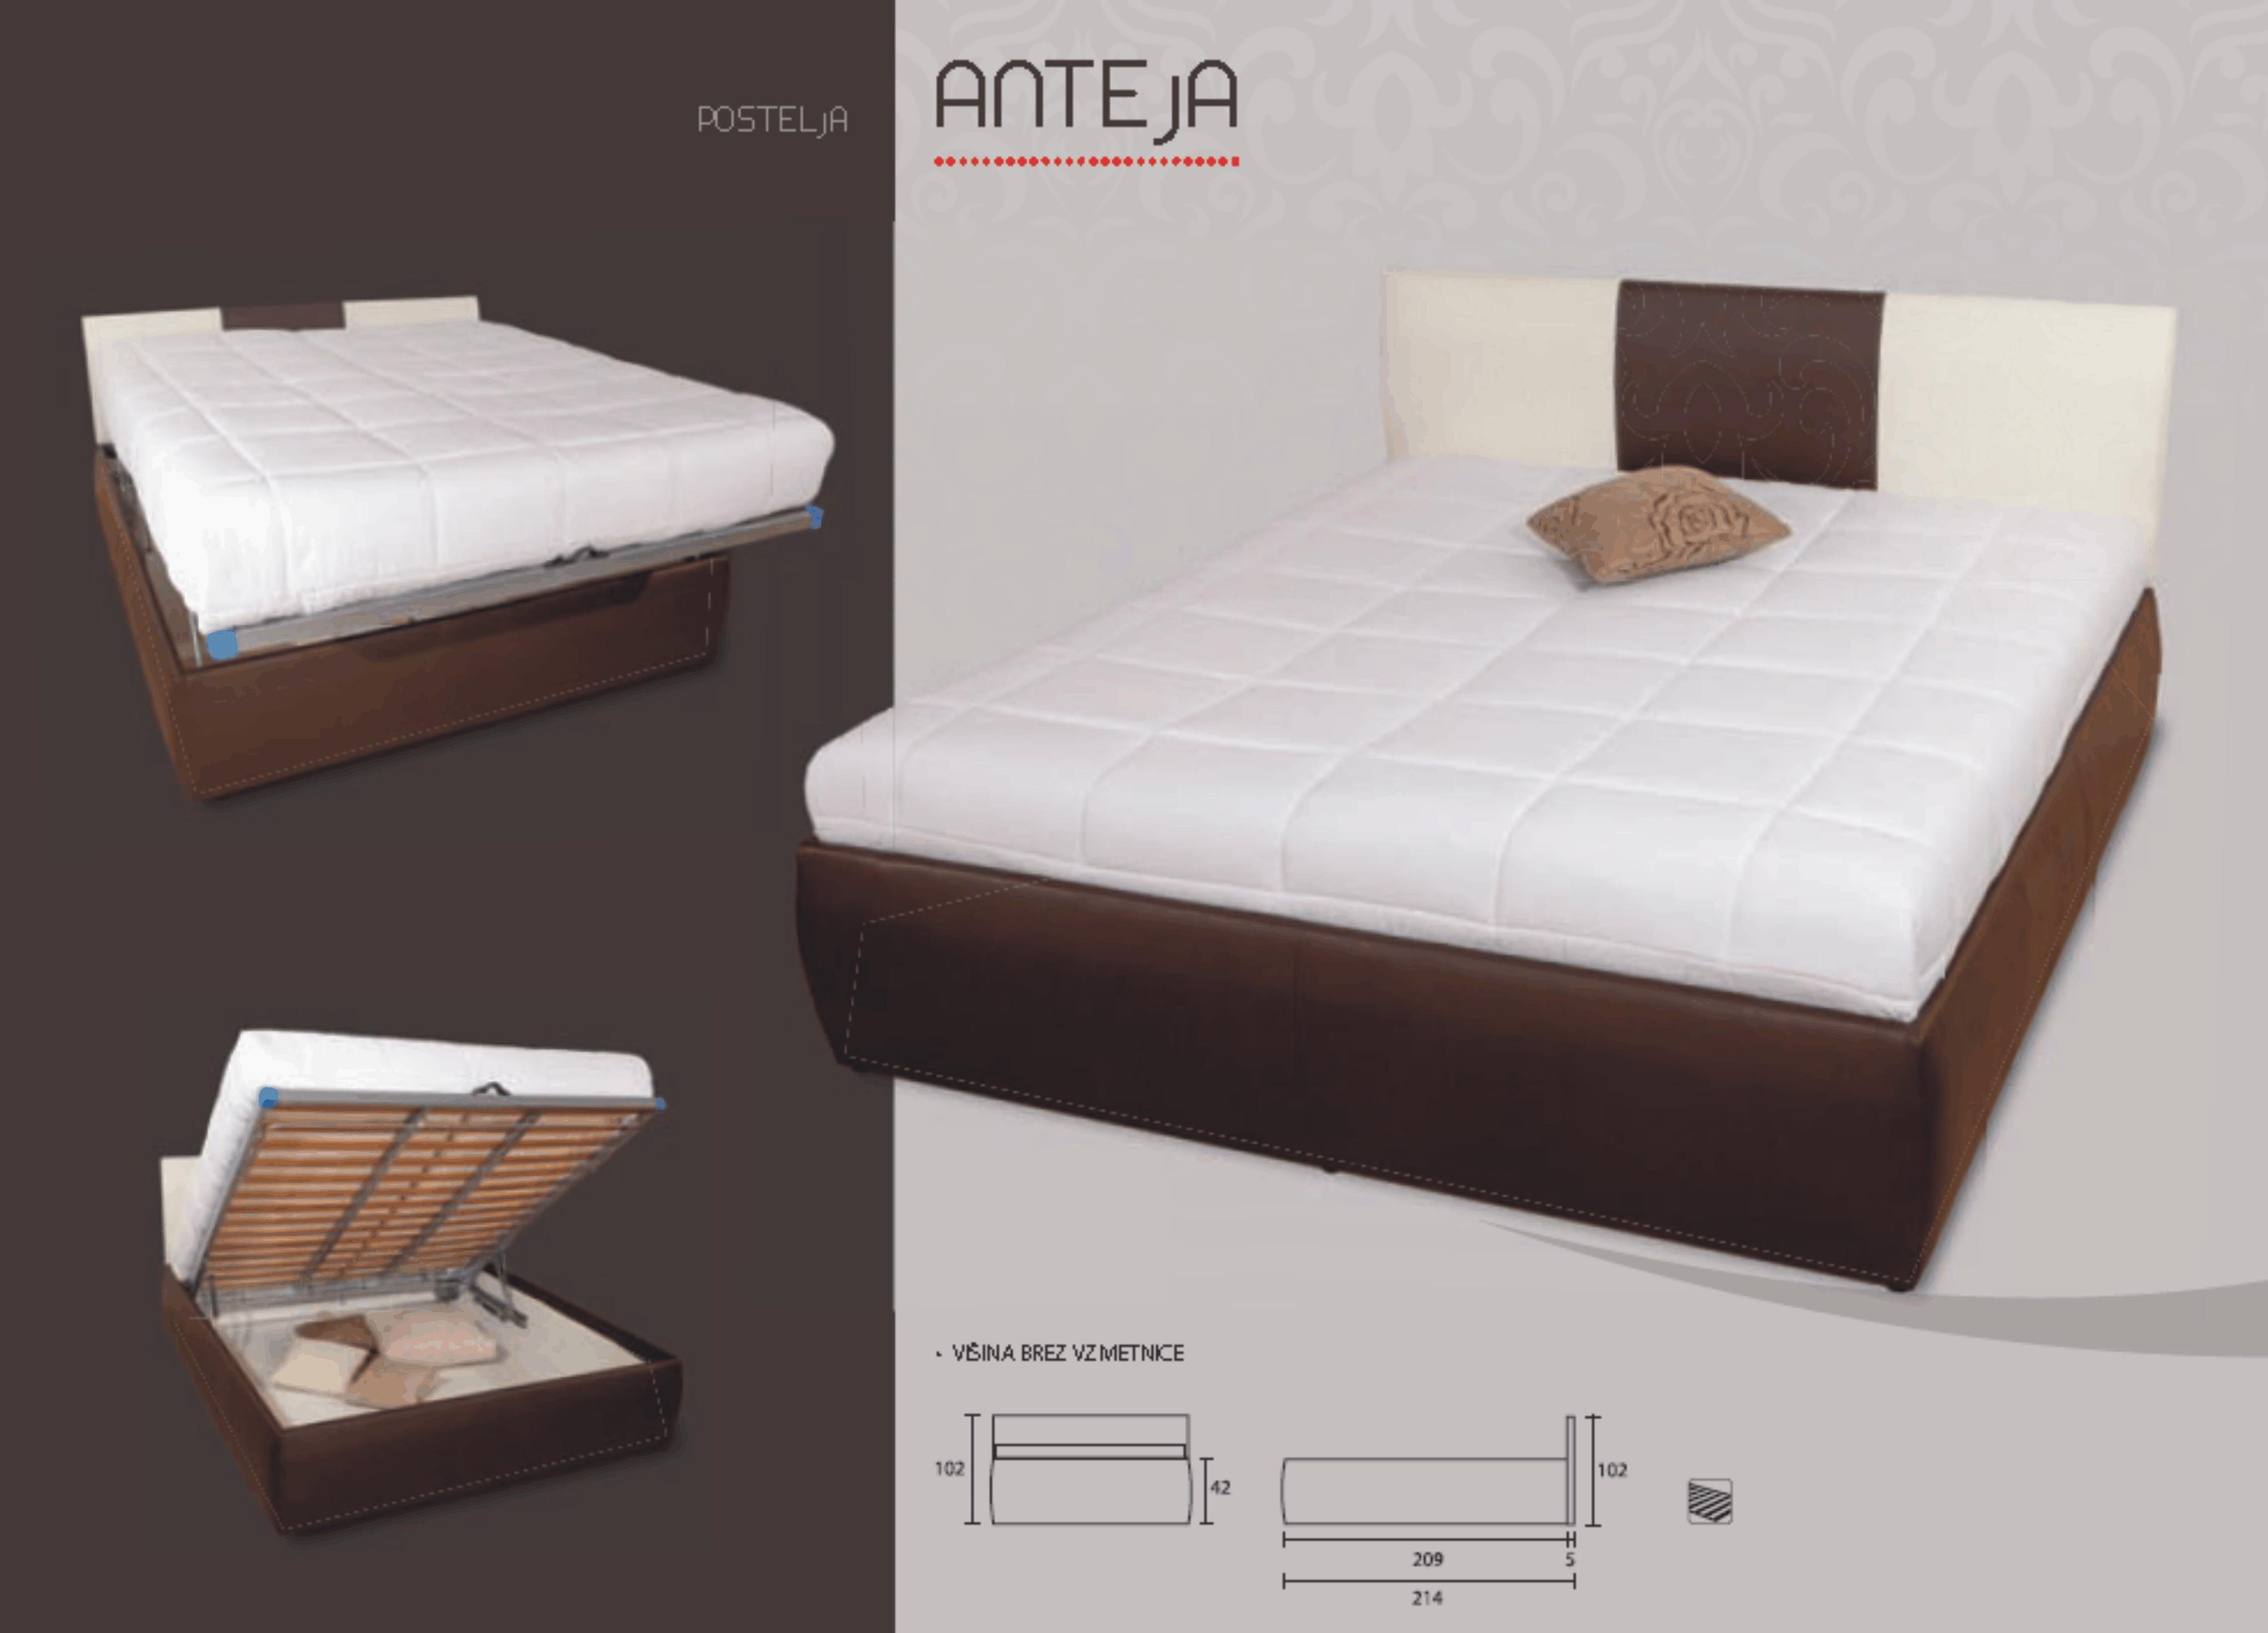 anteja_postelja